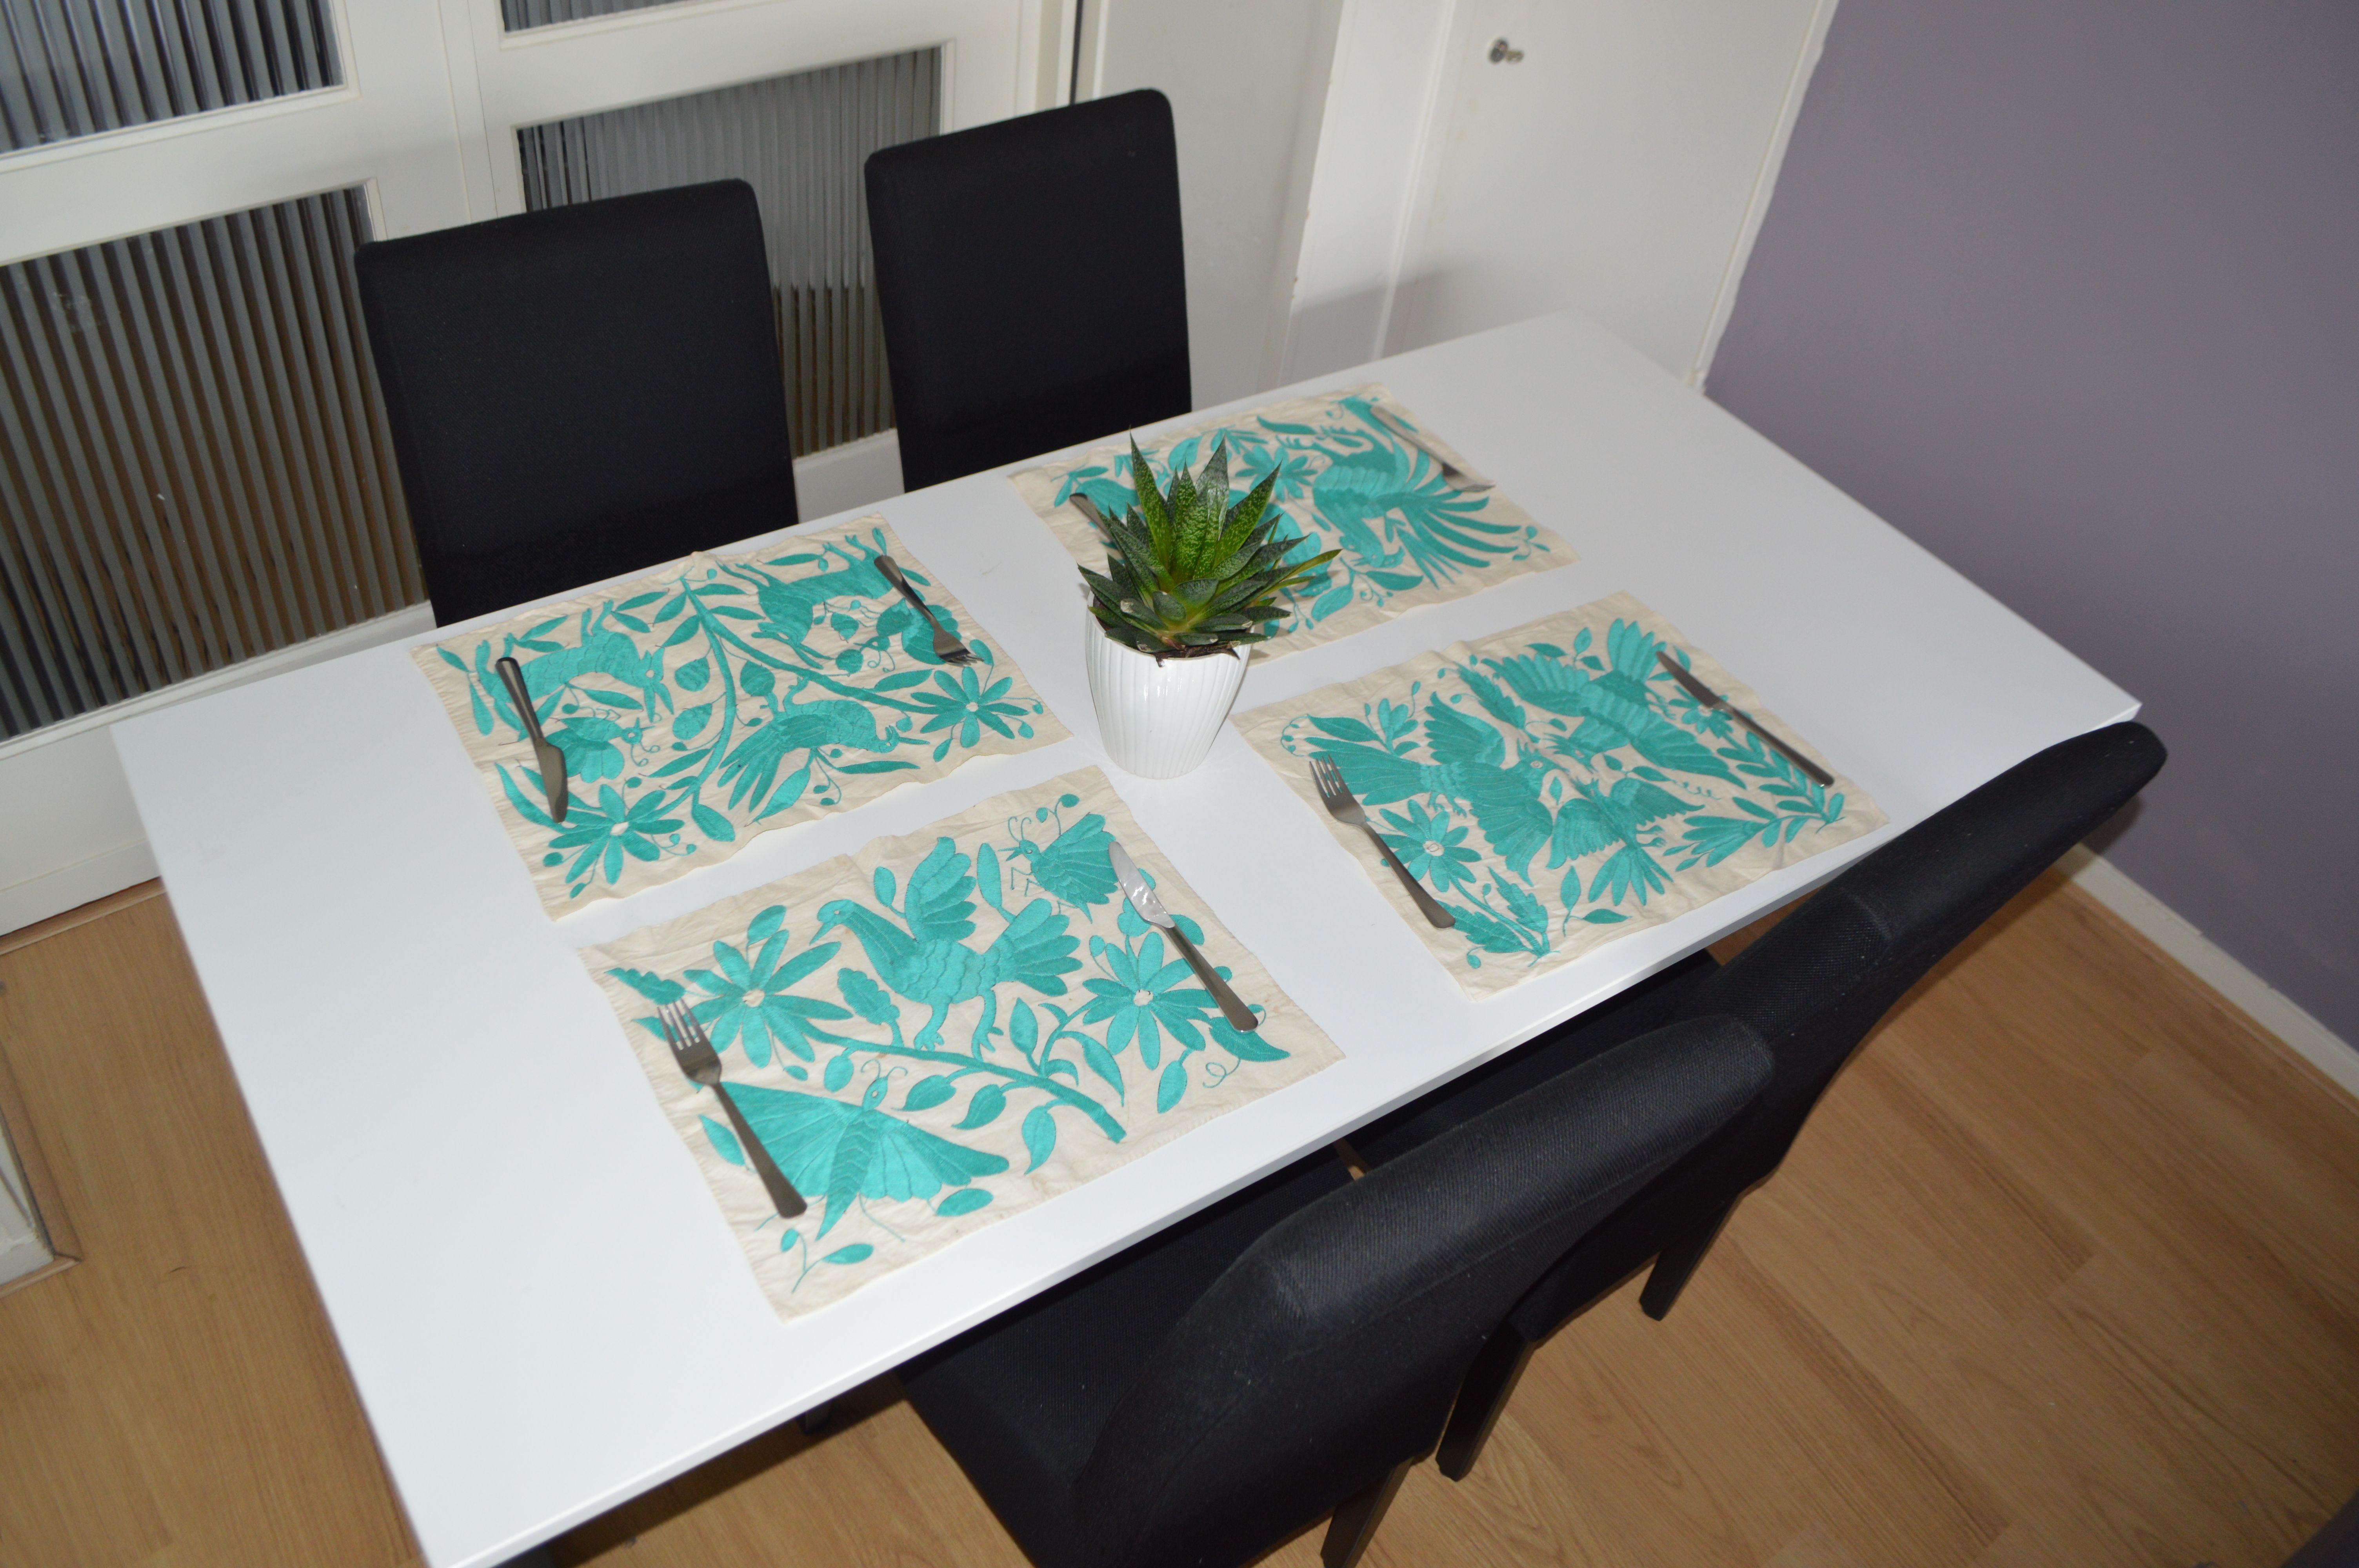 SALE!!! Home & Living, Otomi Mexico, Home Décor, Decorative Pillows ...